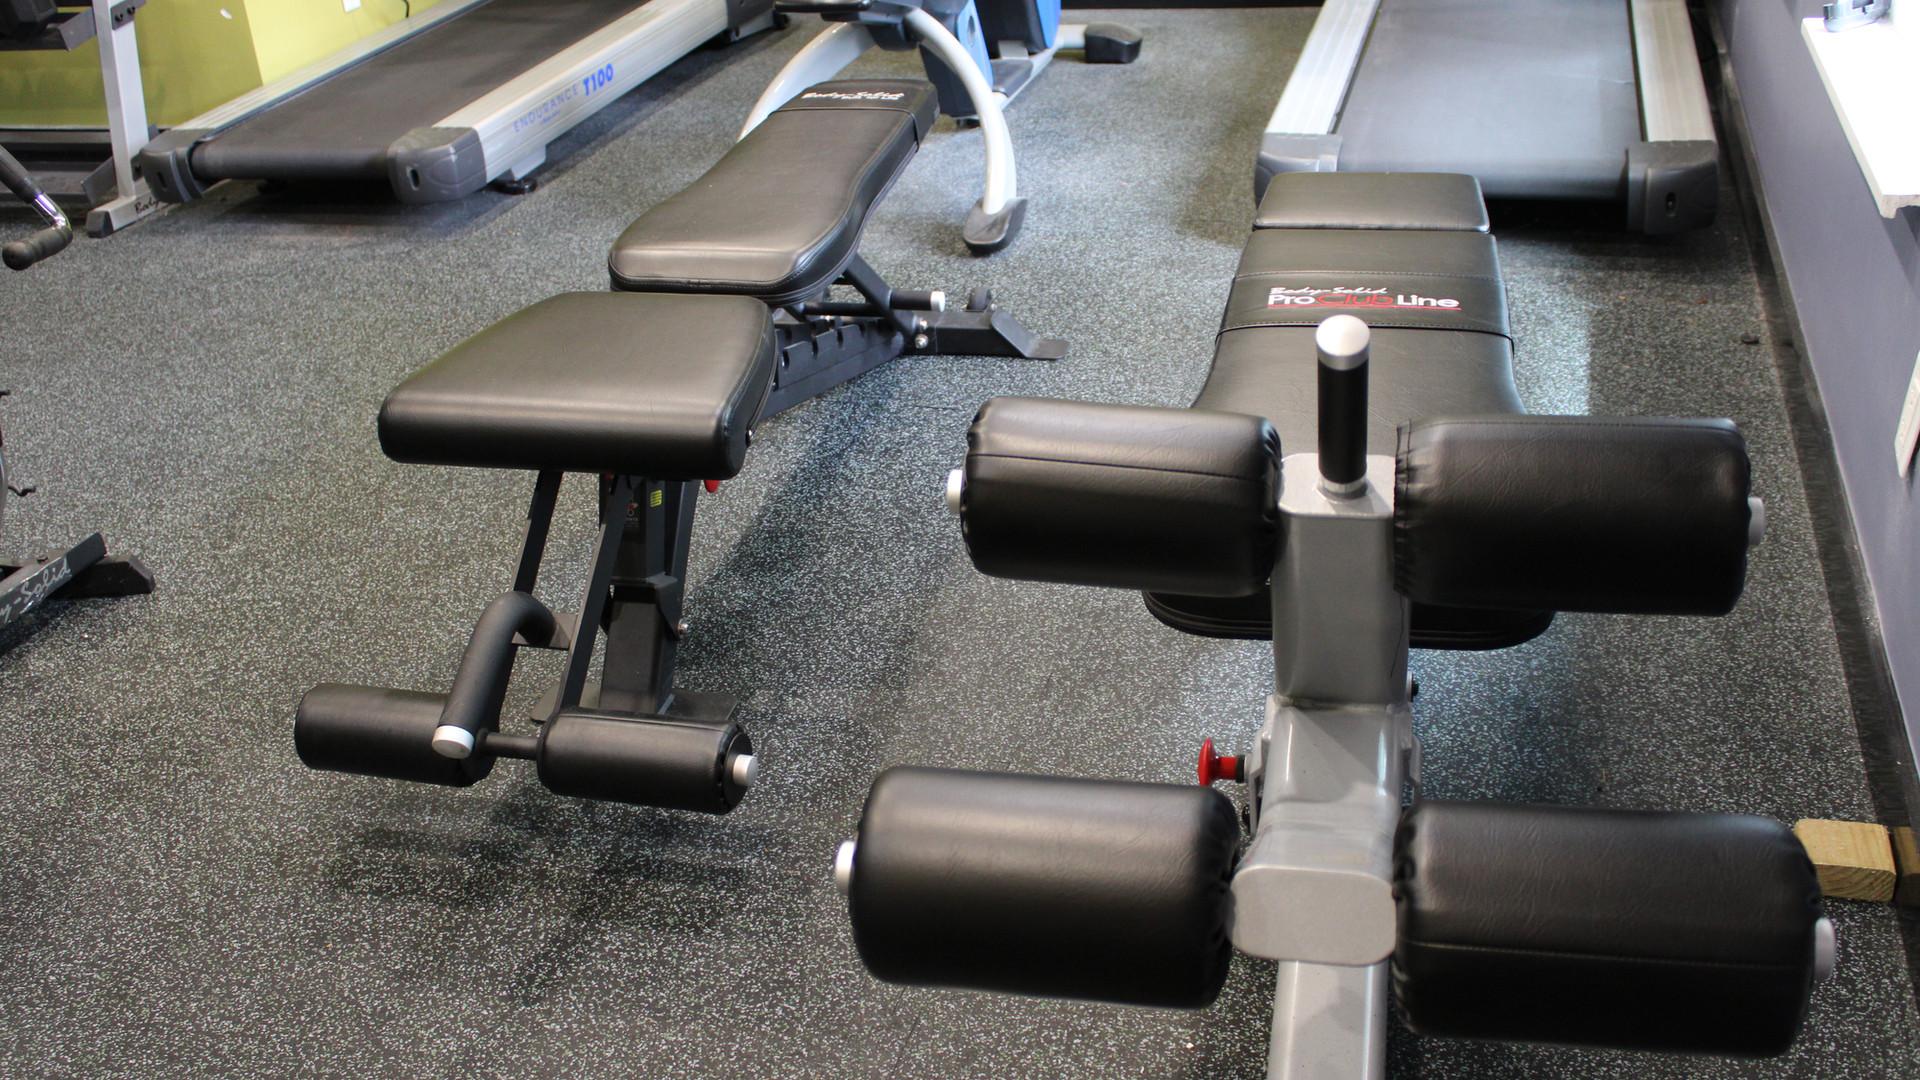 Gym - Benches.JPG